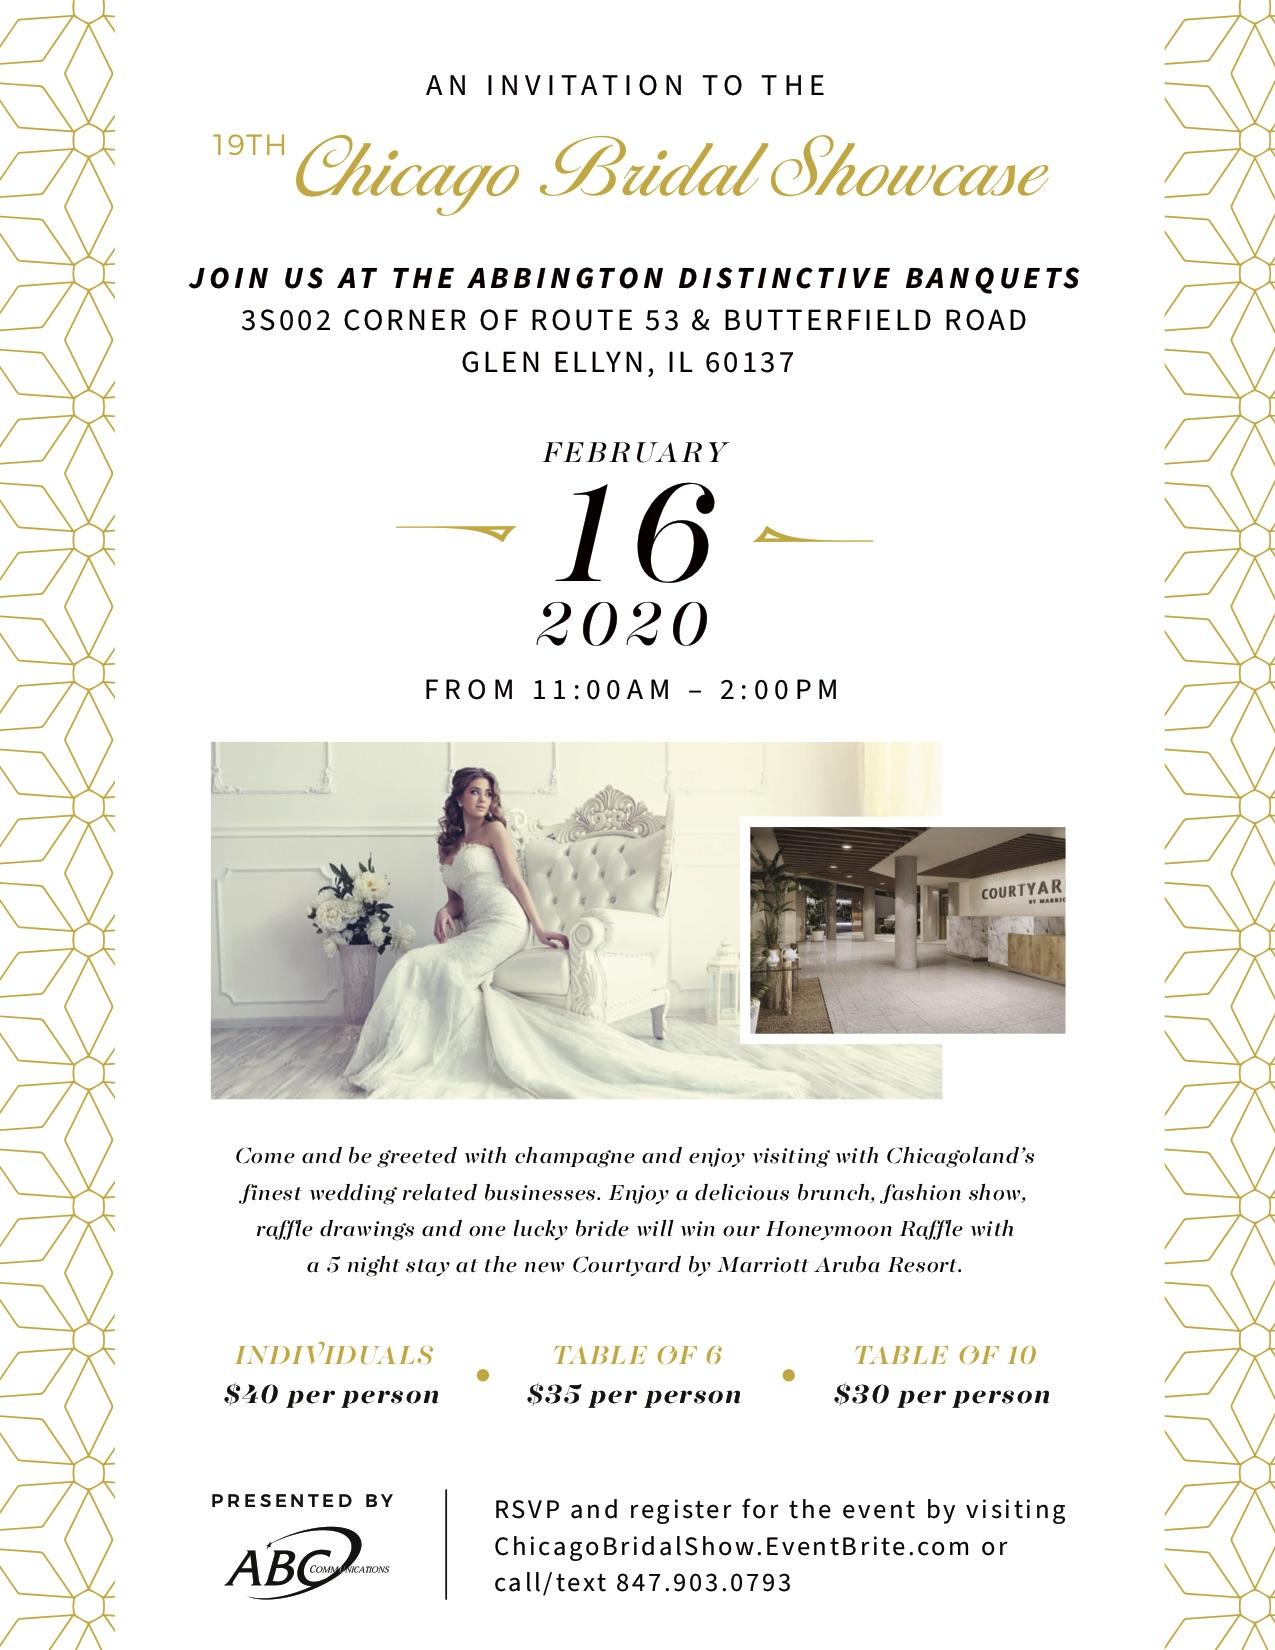 Abbington Distinctive Banquets | Chicago Bridal Show 2020